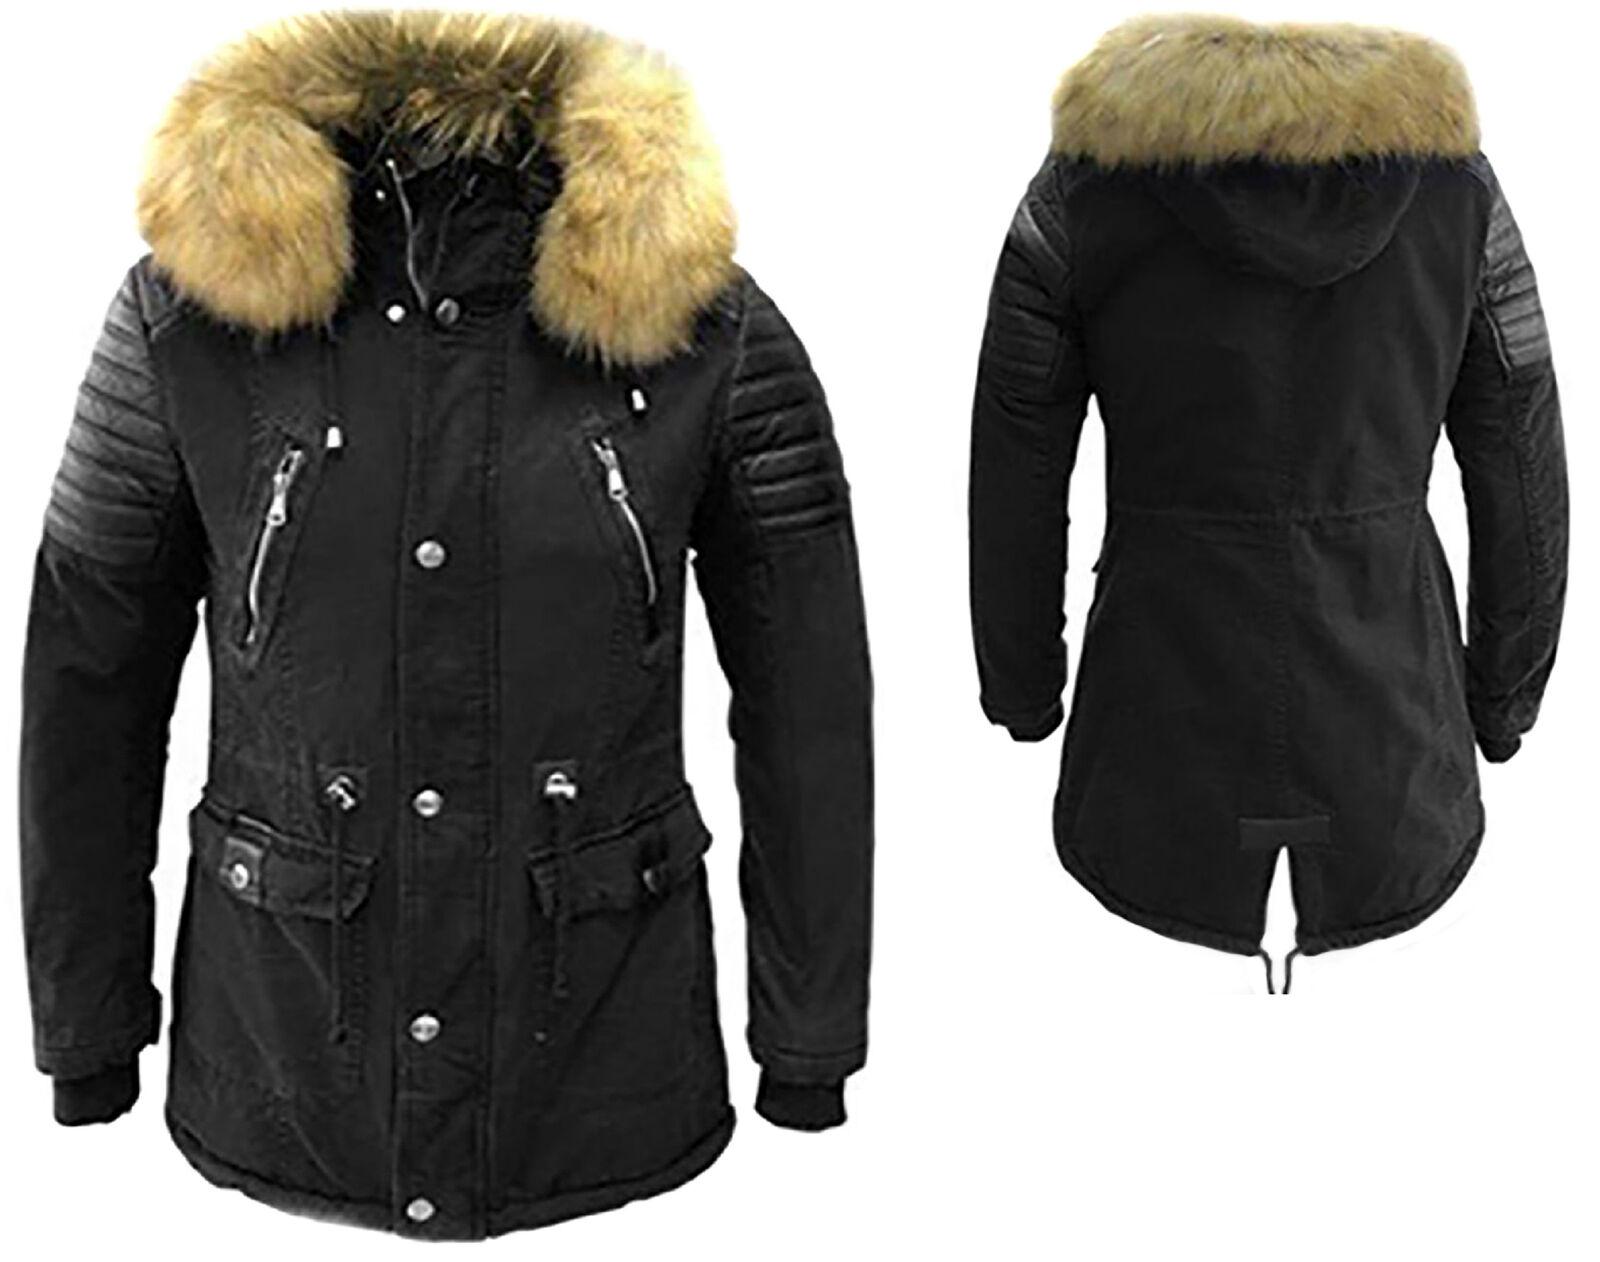 X-FEEL Inverno cappotto Giacca Cappotto breve cappotto Inverno con cappuccio Parka Cappotto 88828 Pardo Nero af811b